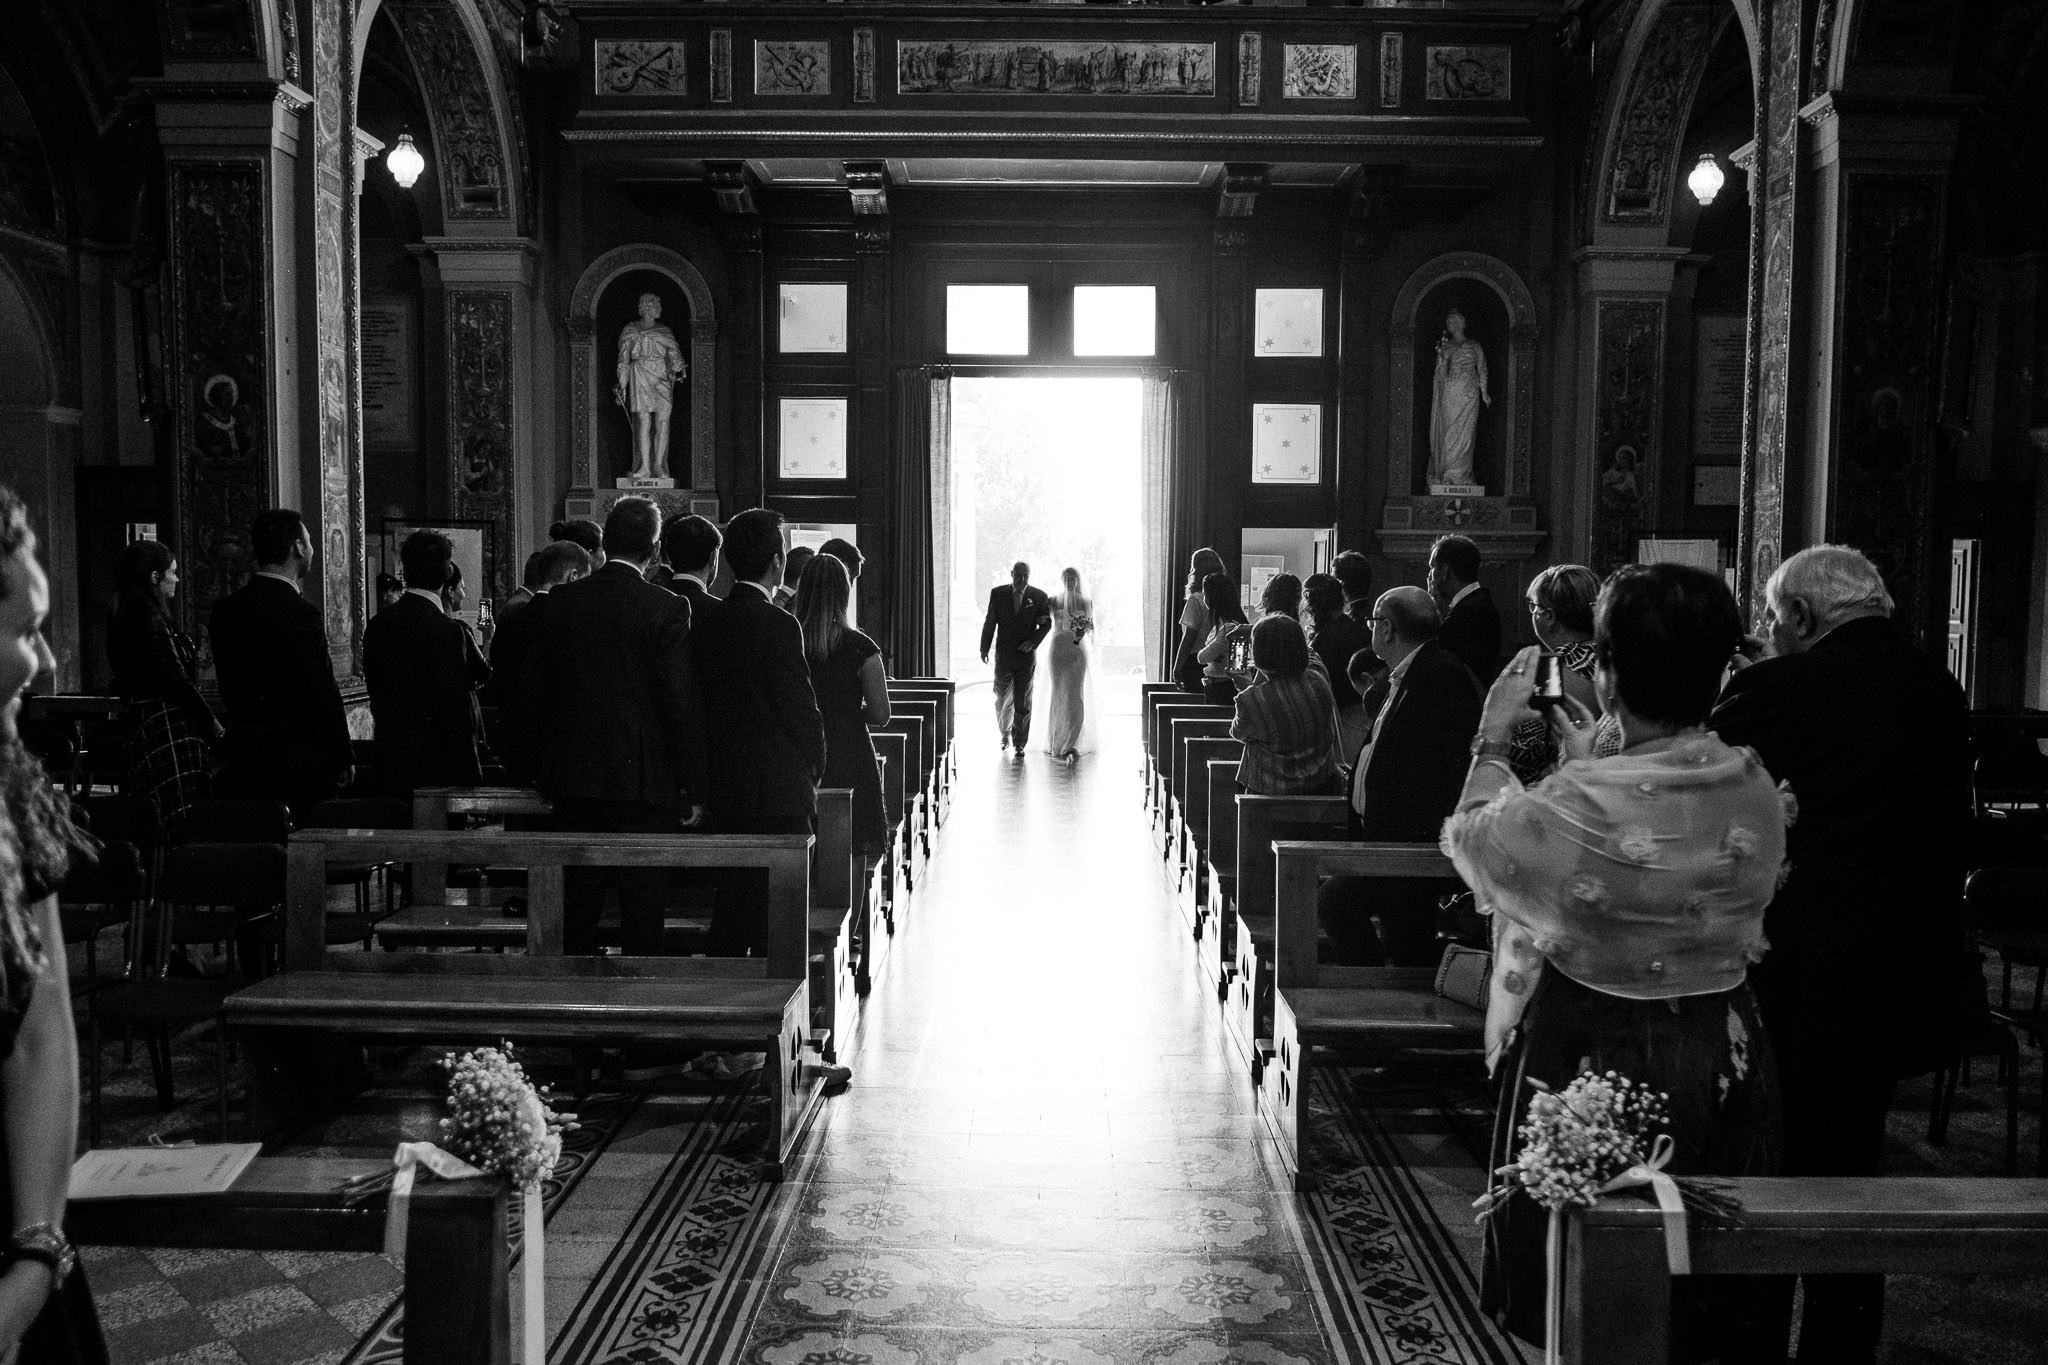 fotografo matrimonio cascina diodona varese lucarossifoto 00009